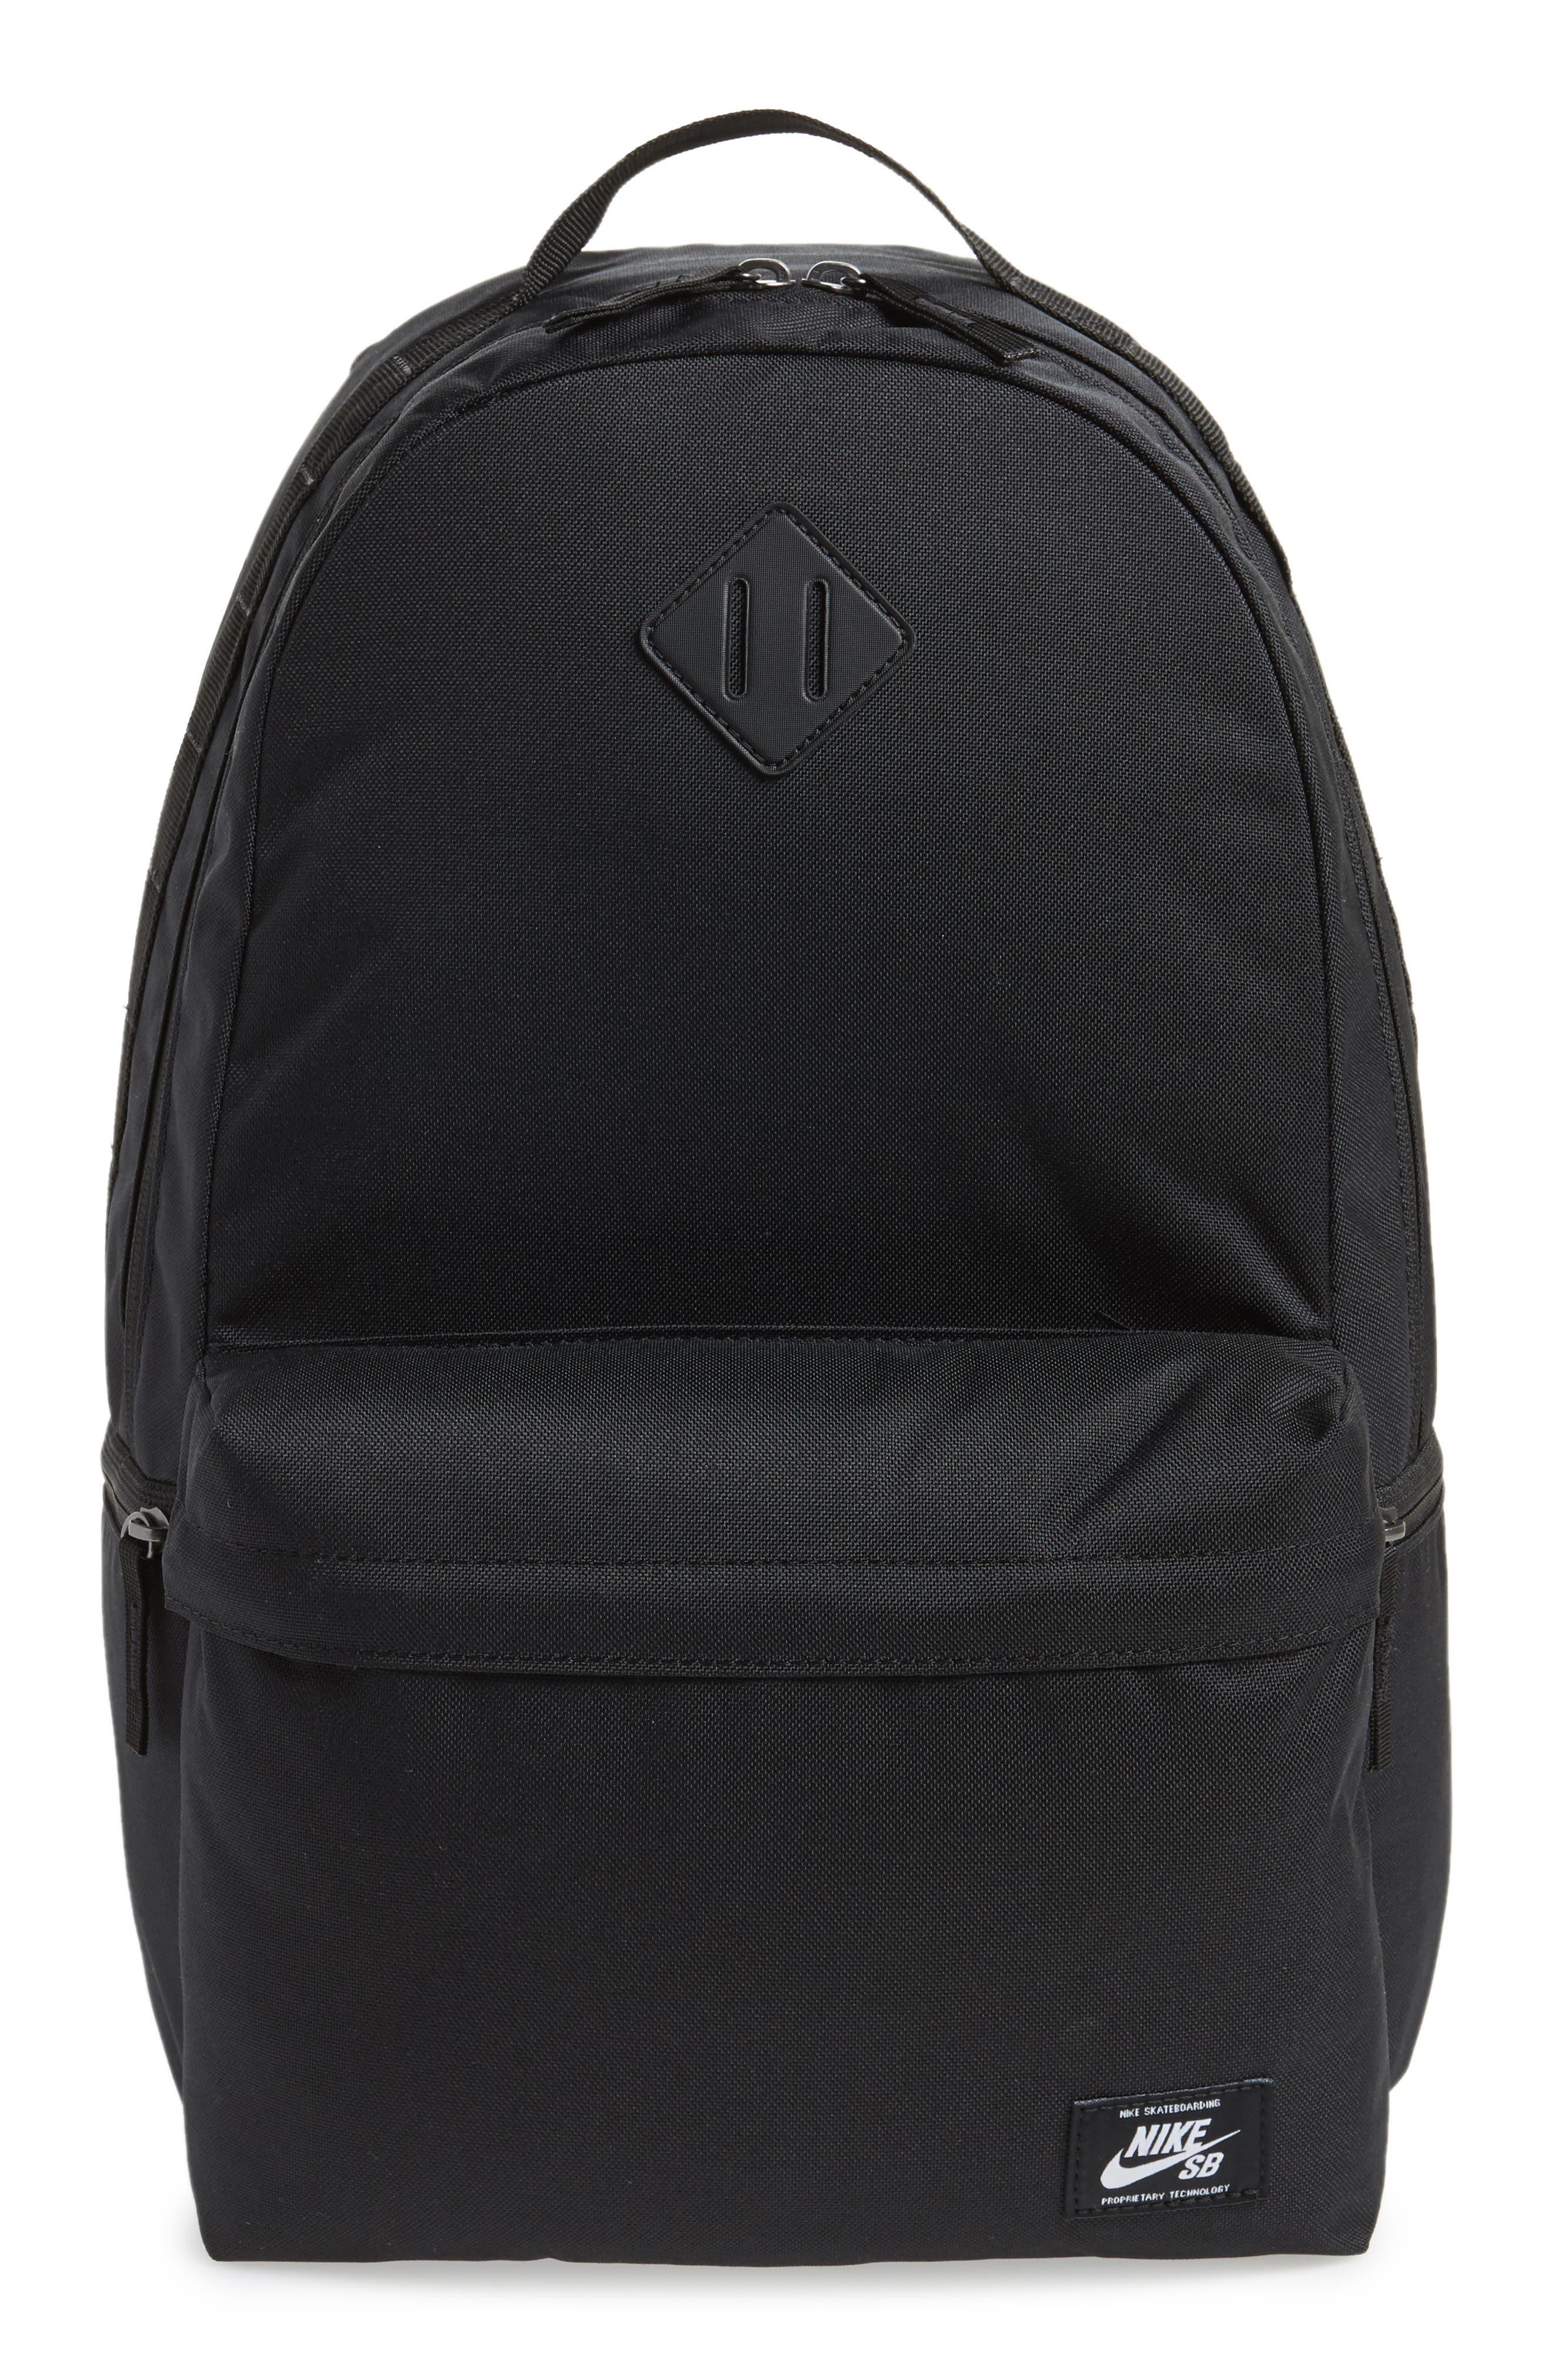 Icon Backpack,                             Main thumbnail 1, color,                             010